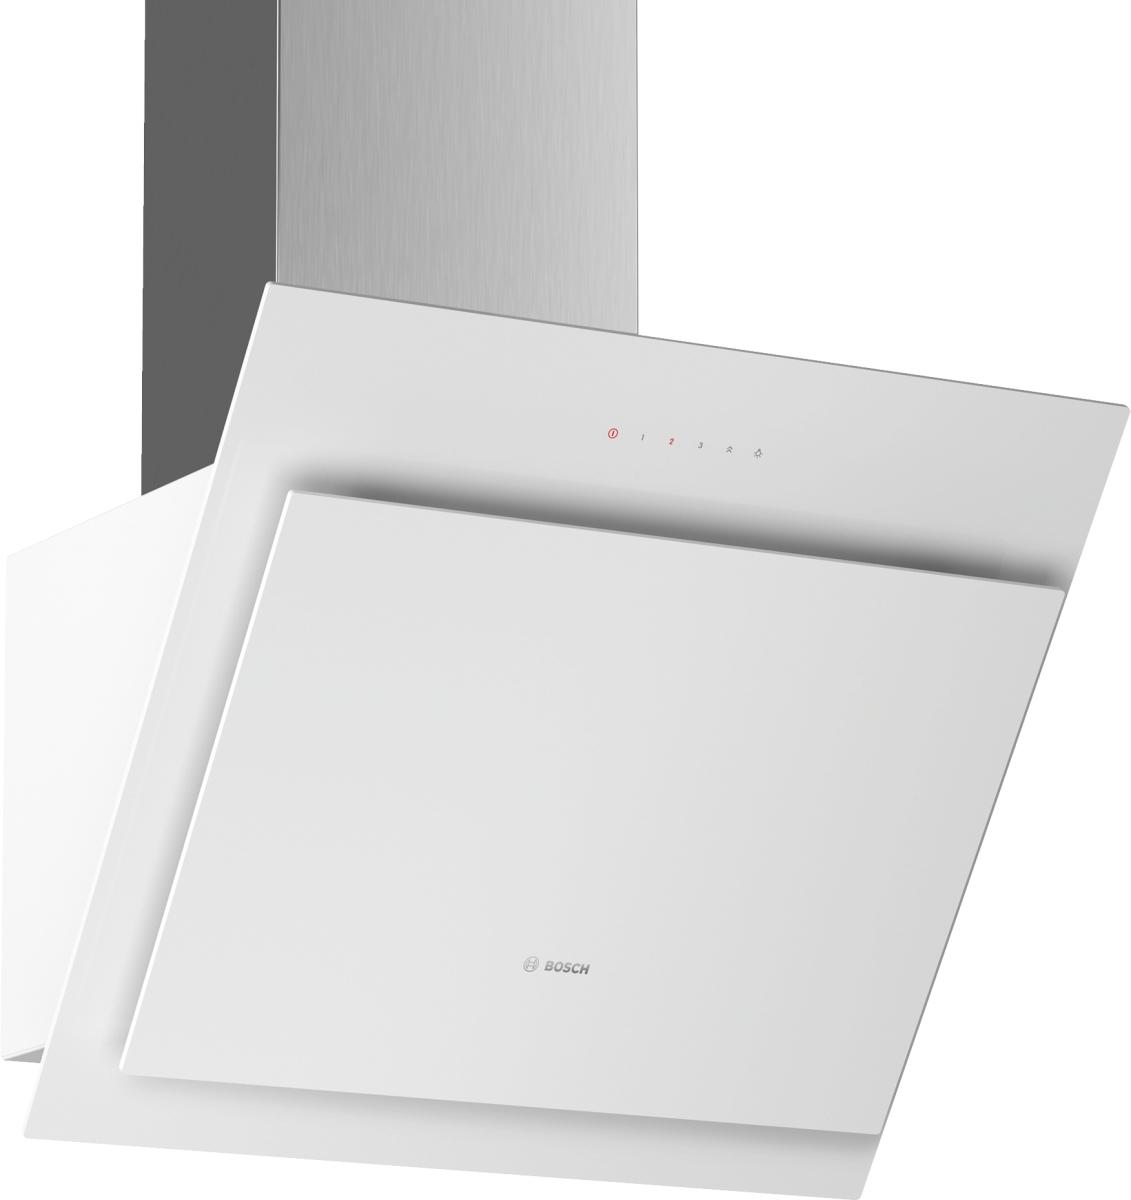 Bosch DWK67CM20 Wandesse 60 cm weissLEDDirectSelect-Bedienung